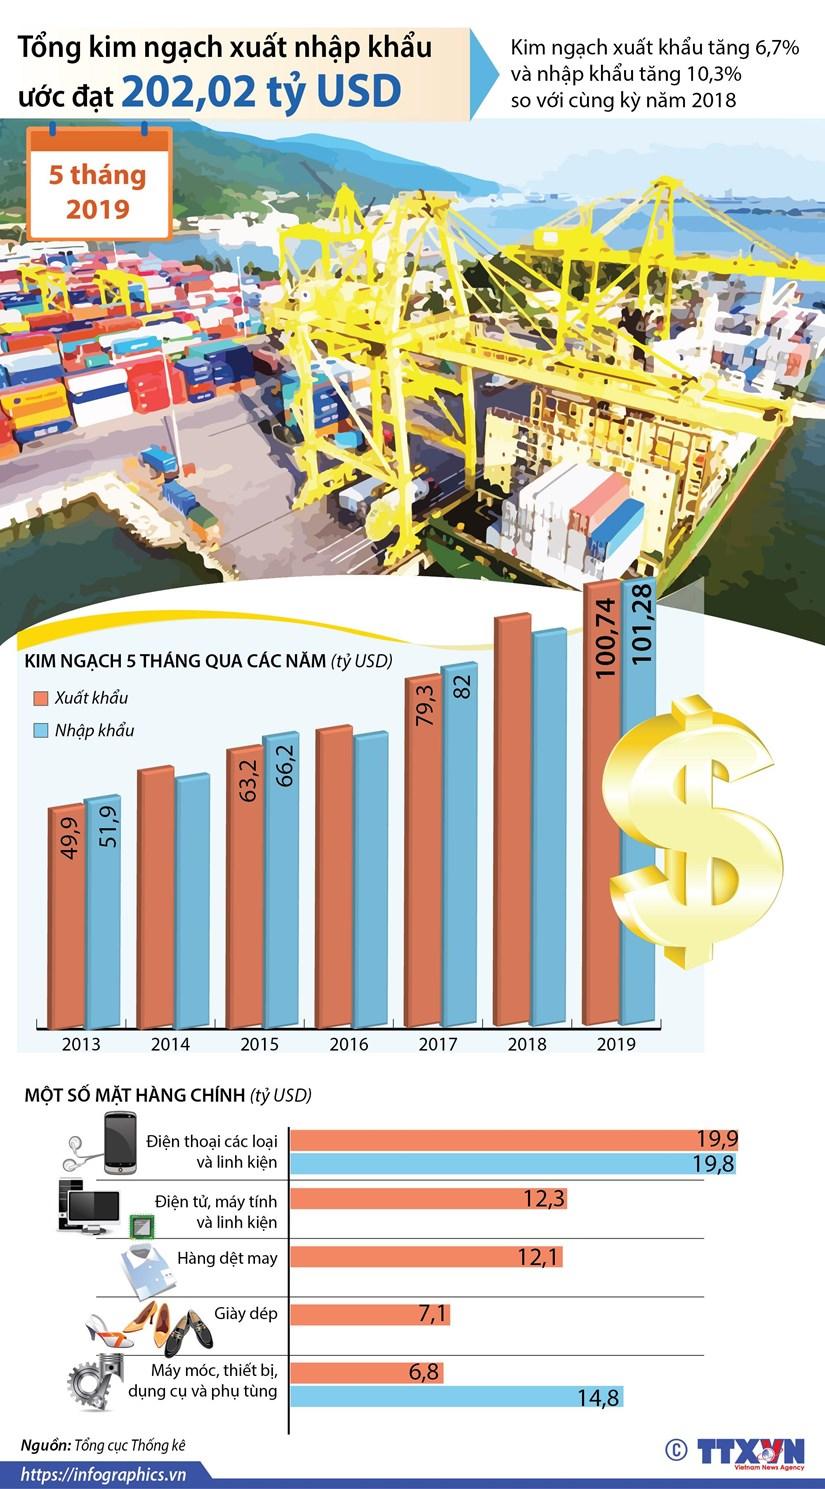 [Infographics] 5 thang, xuat nhap khau hang hoa uoc dat 202 ty USD hinh anh 1